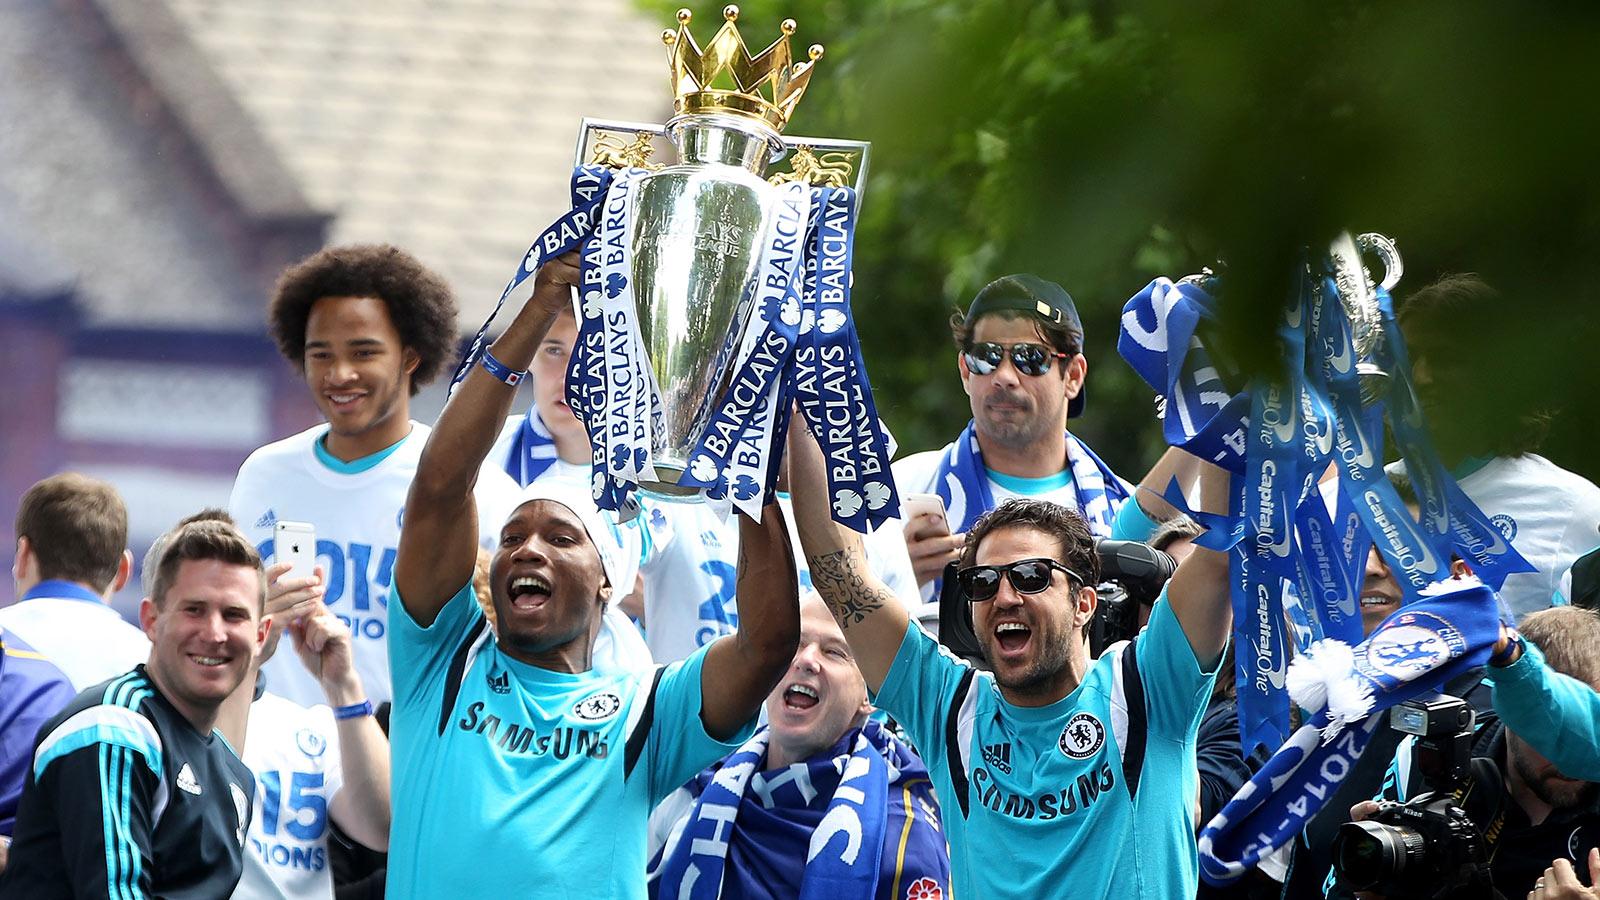 010616-SOCCER-Didier-Drogba-and-Cesc-Fabregas-of-Chelsea-celebrate-PI